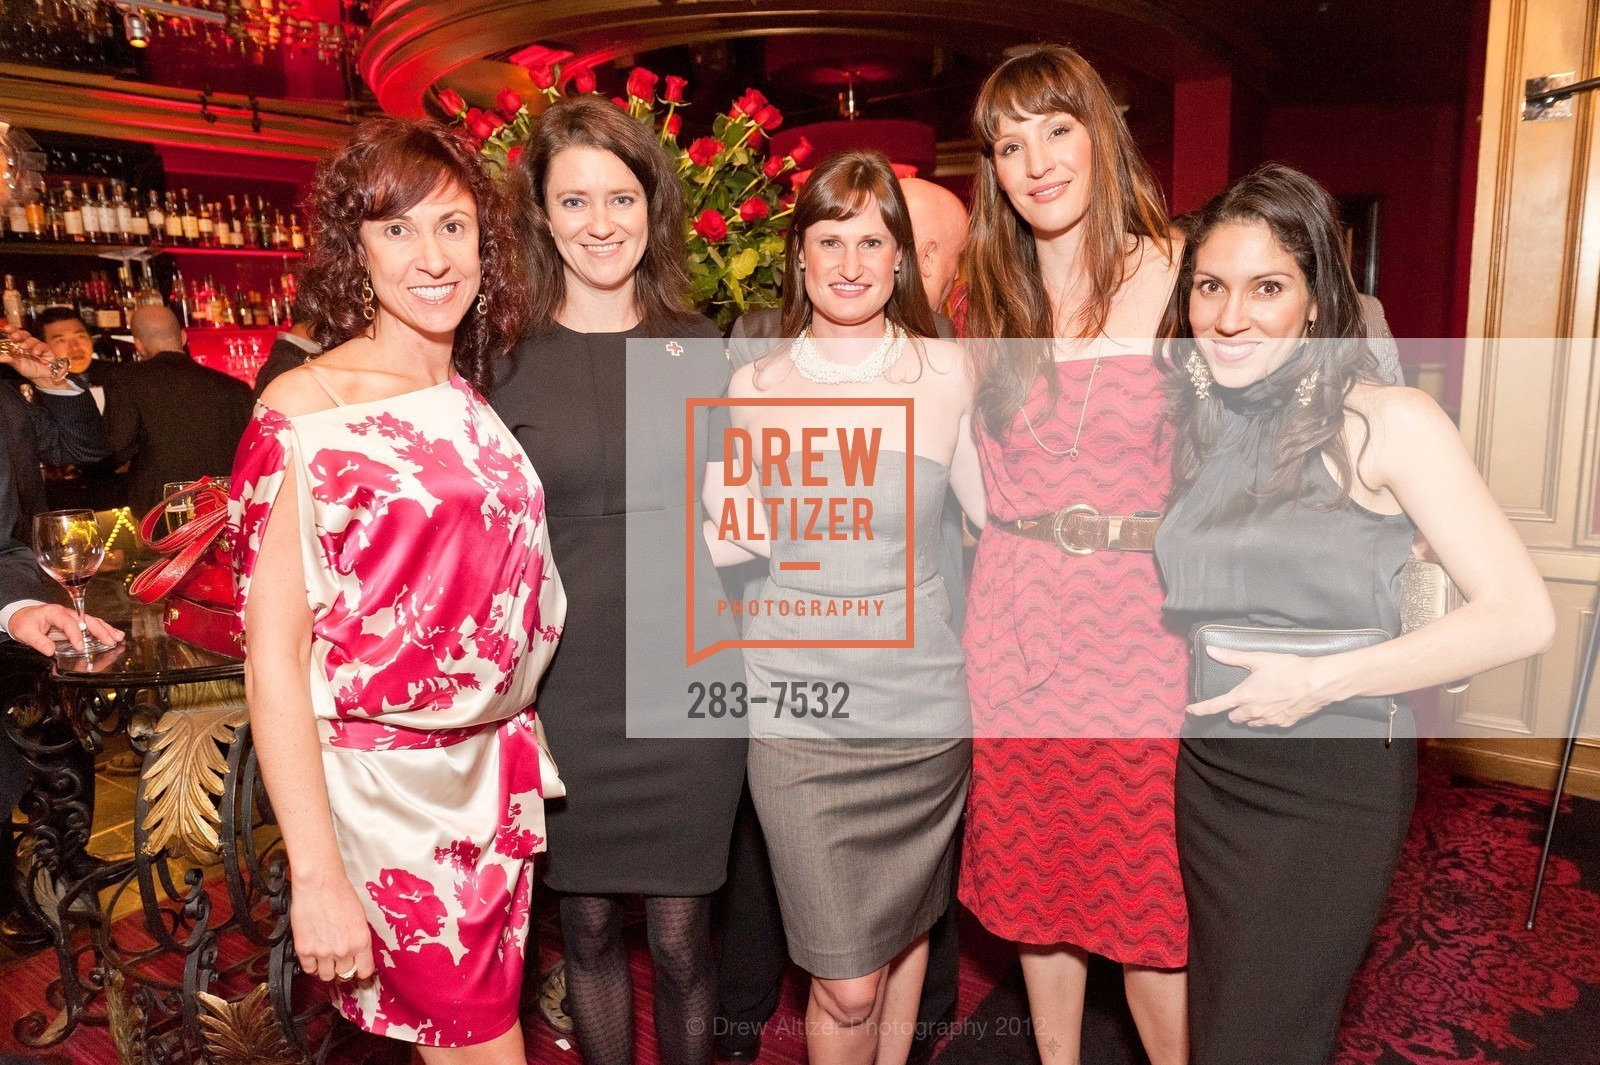 Tina Deeb, Kirsten Strobel, Carol Morganstern. Kirsten Skipper, Maria Anguiano, Photo #283-7532